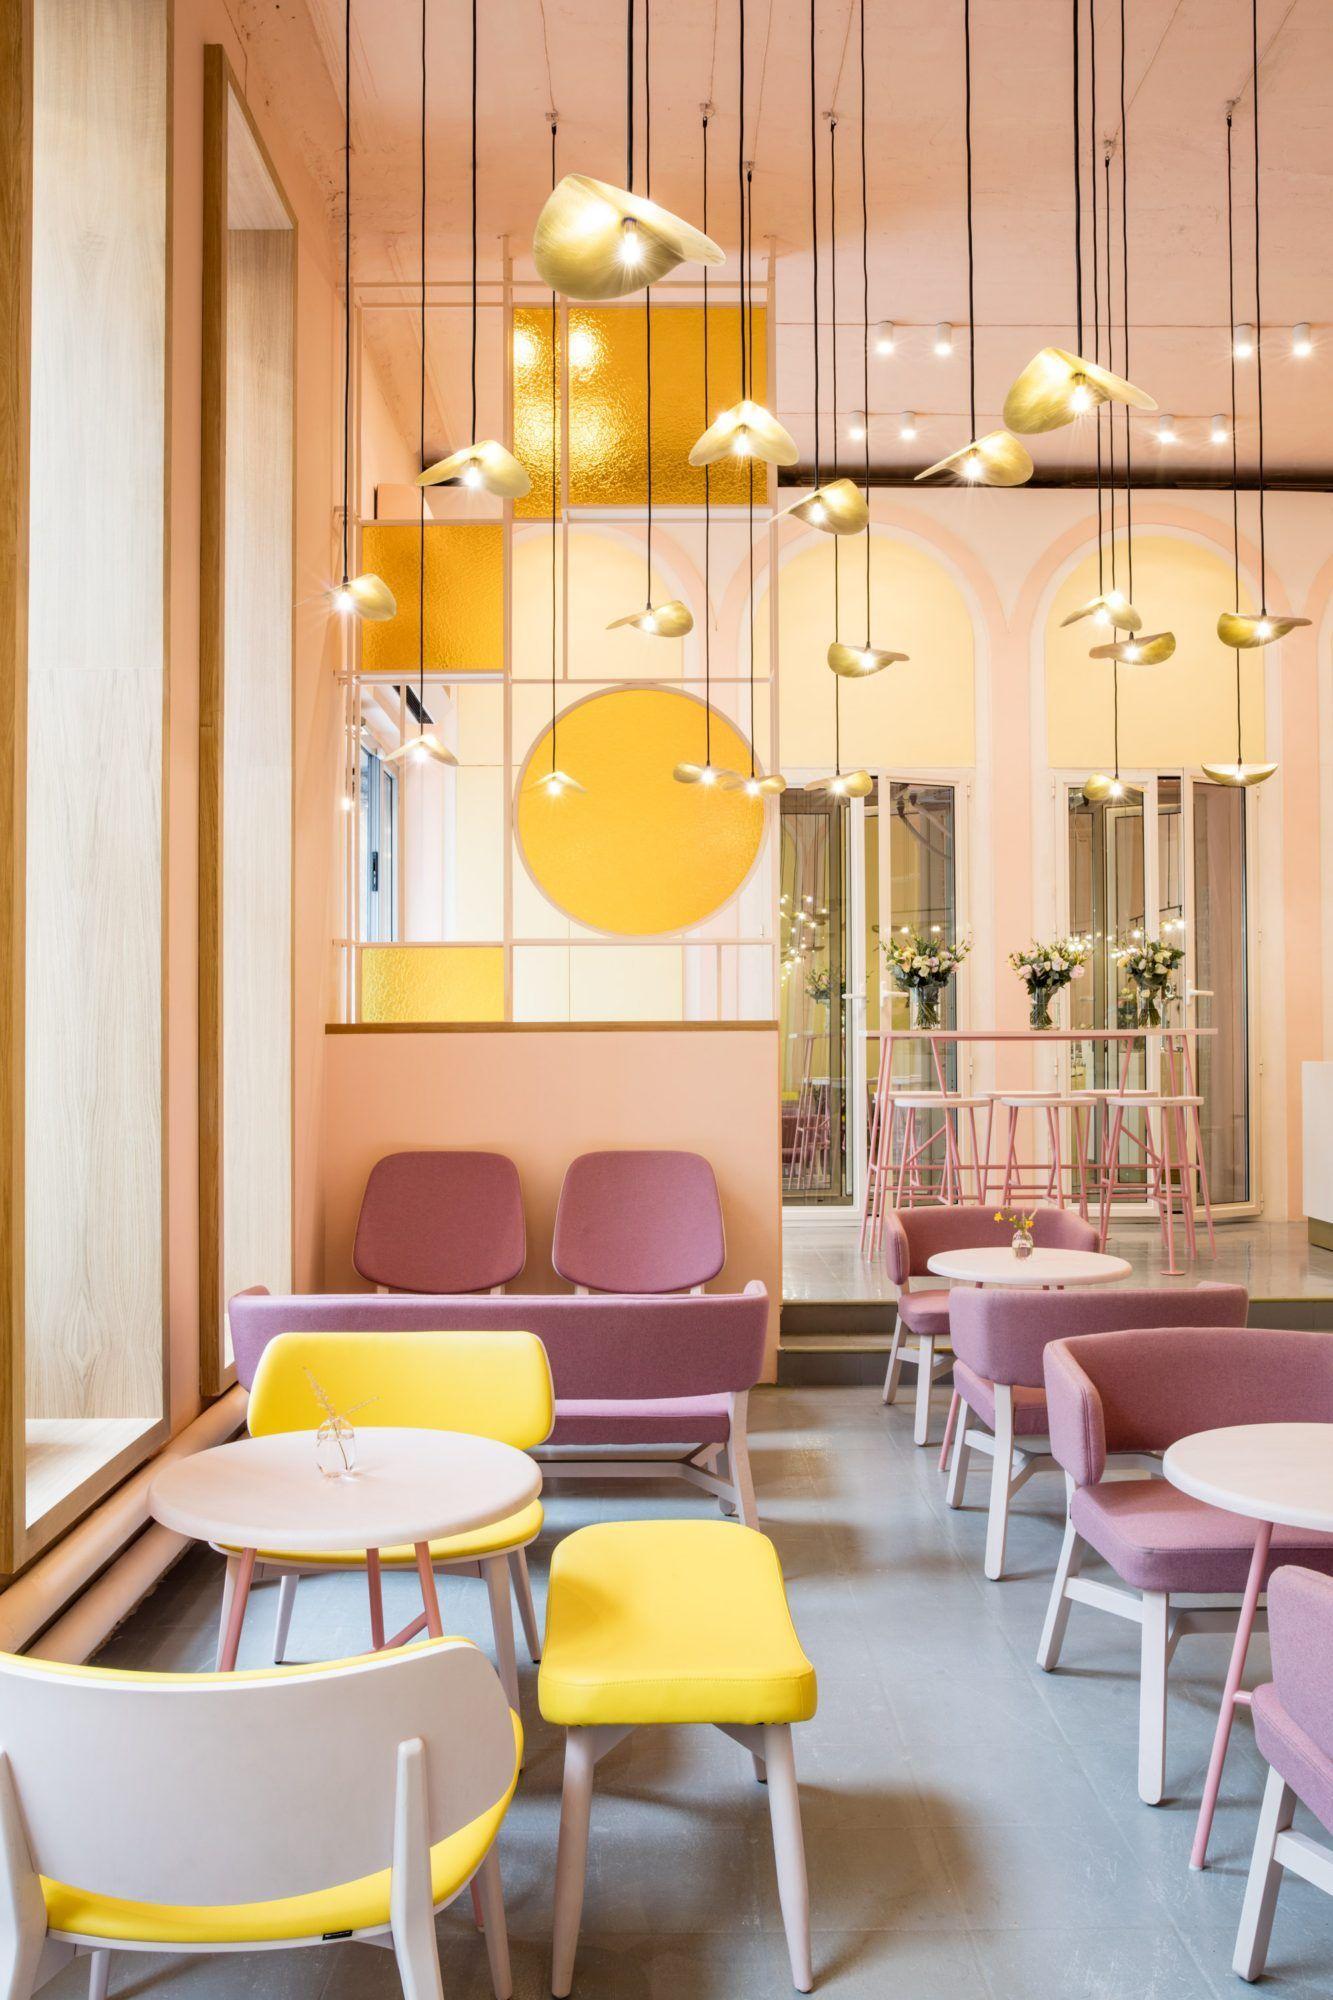 Top 20 Online Lighting Stores You Should Have An Eye For Cafe Interior Design Restaurant Interior Design Cafe Interior